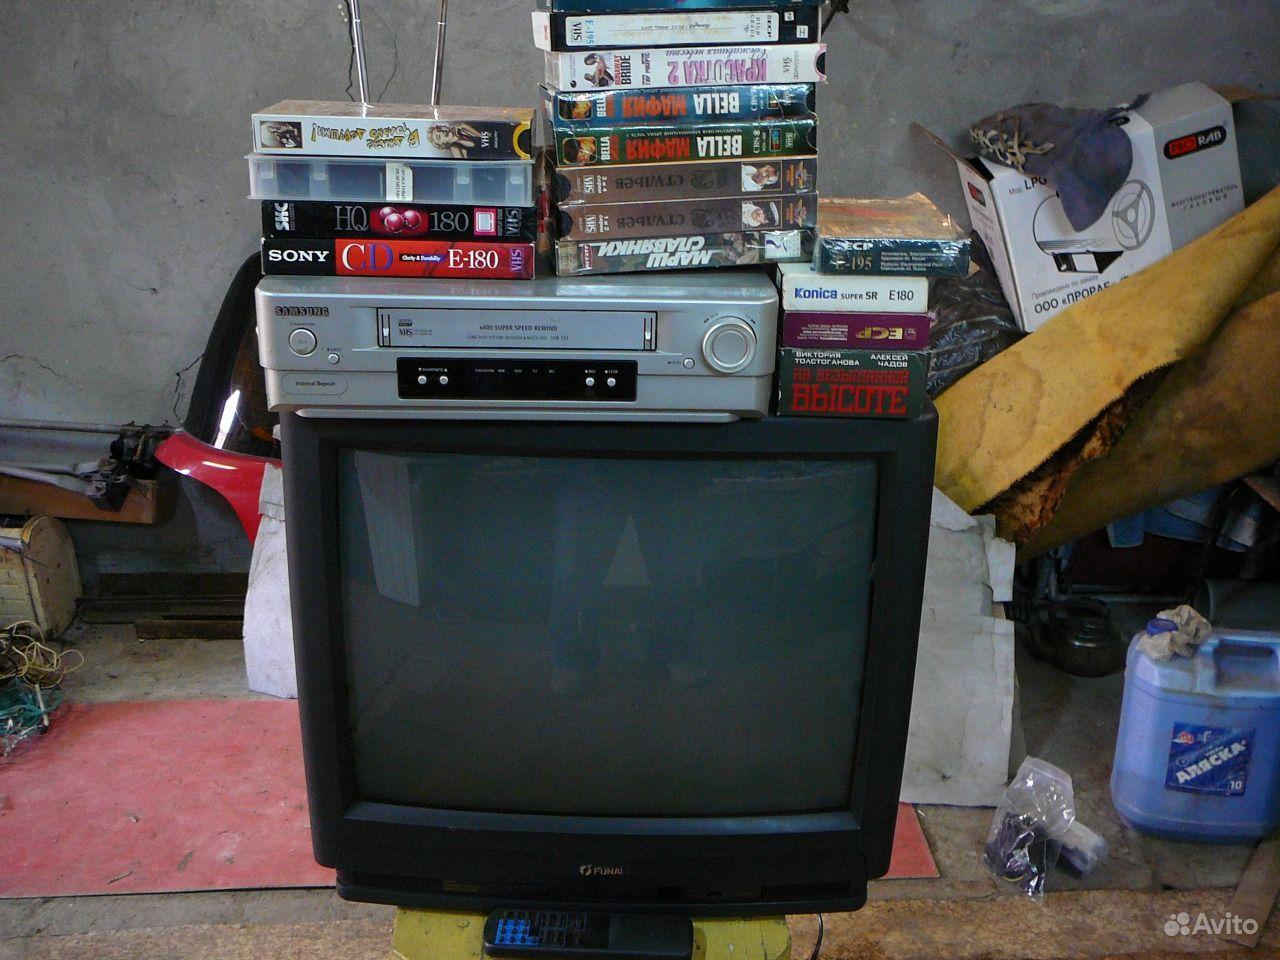 Продам 4 телевизора,видик,двд,сд рекордер [Архив] - Одесский форум